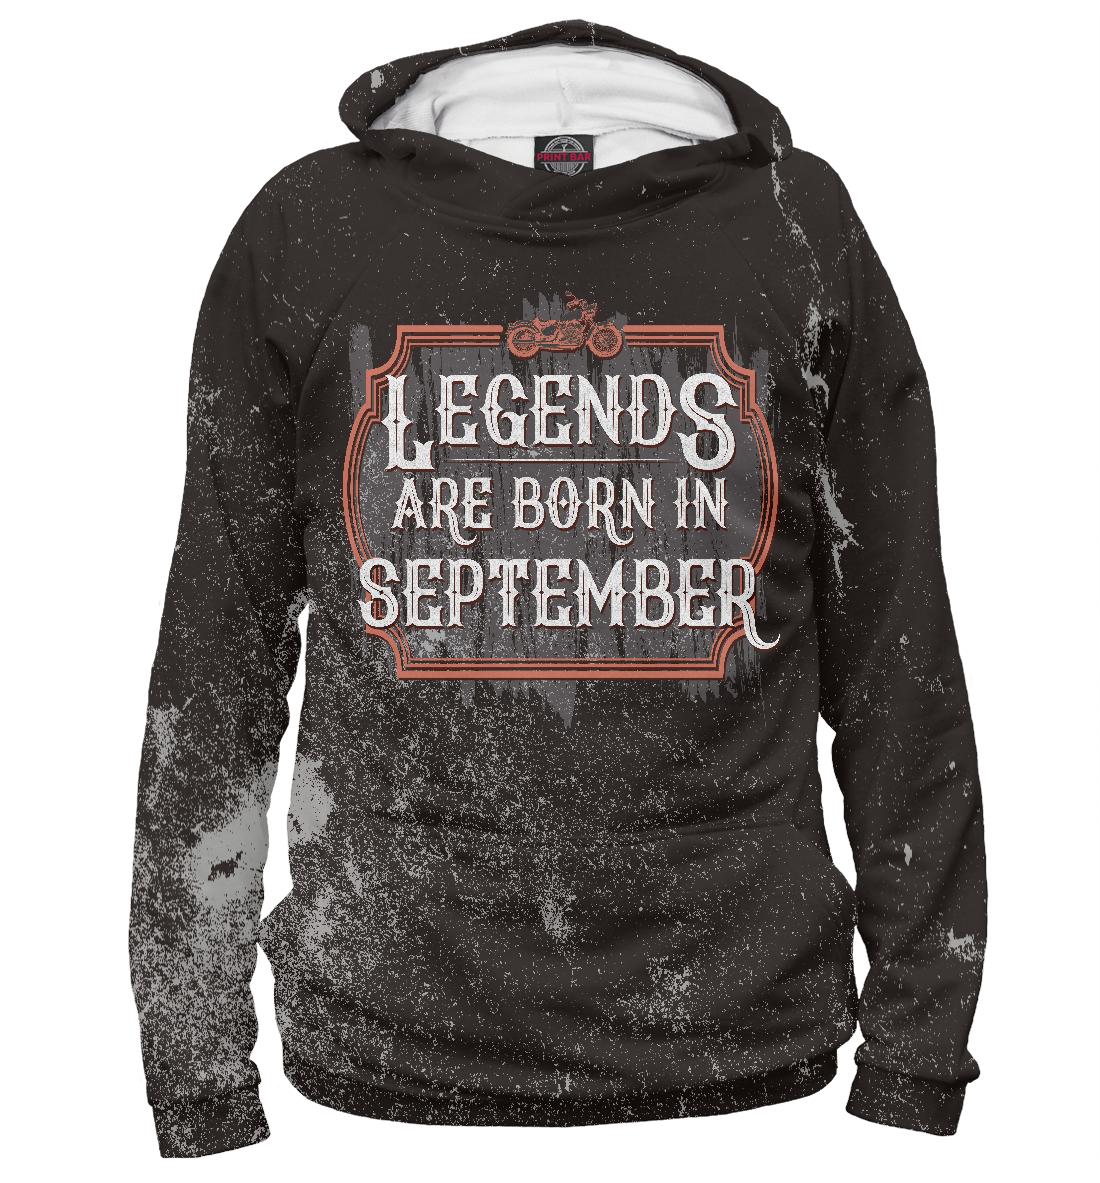 Купить Legends Are Born In September, Printbar, Худи, SEN-799630-hud-2